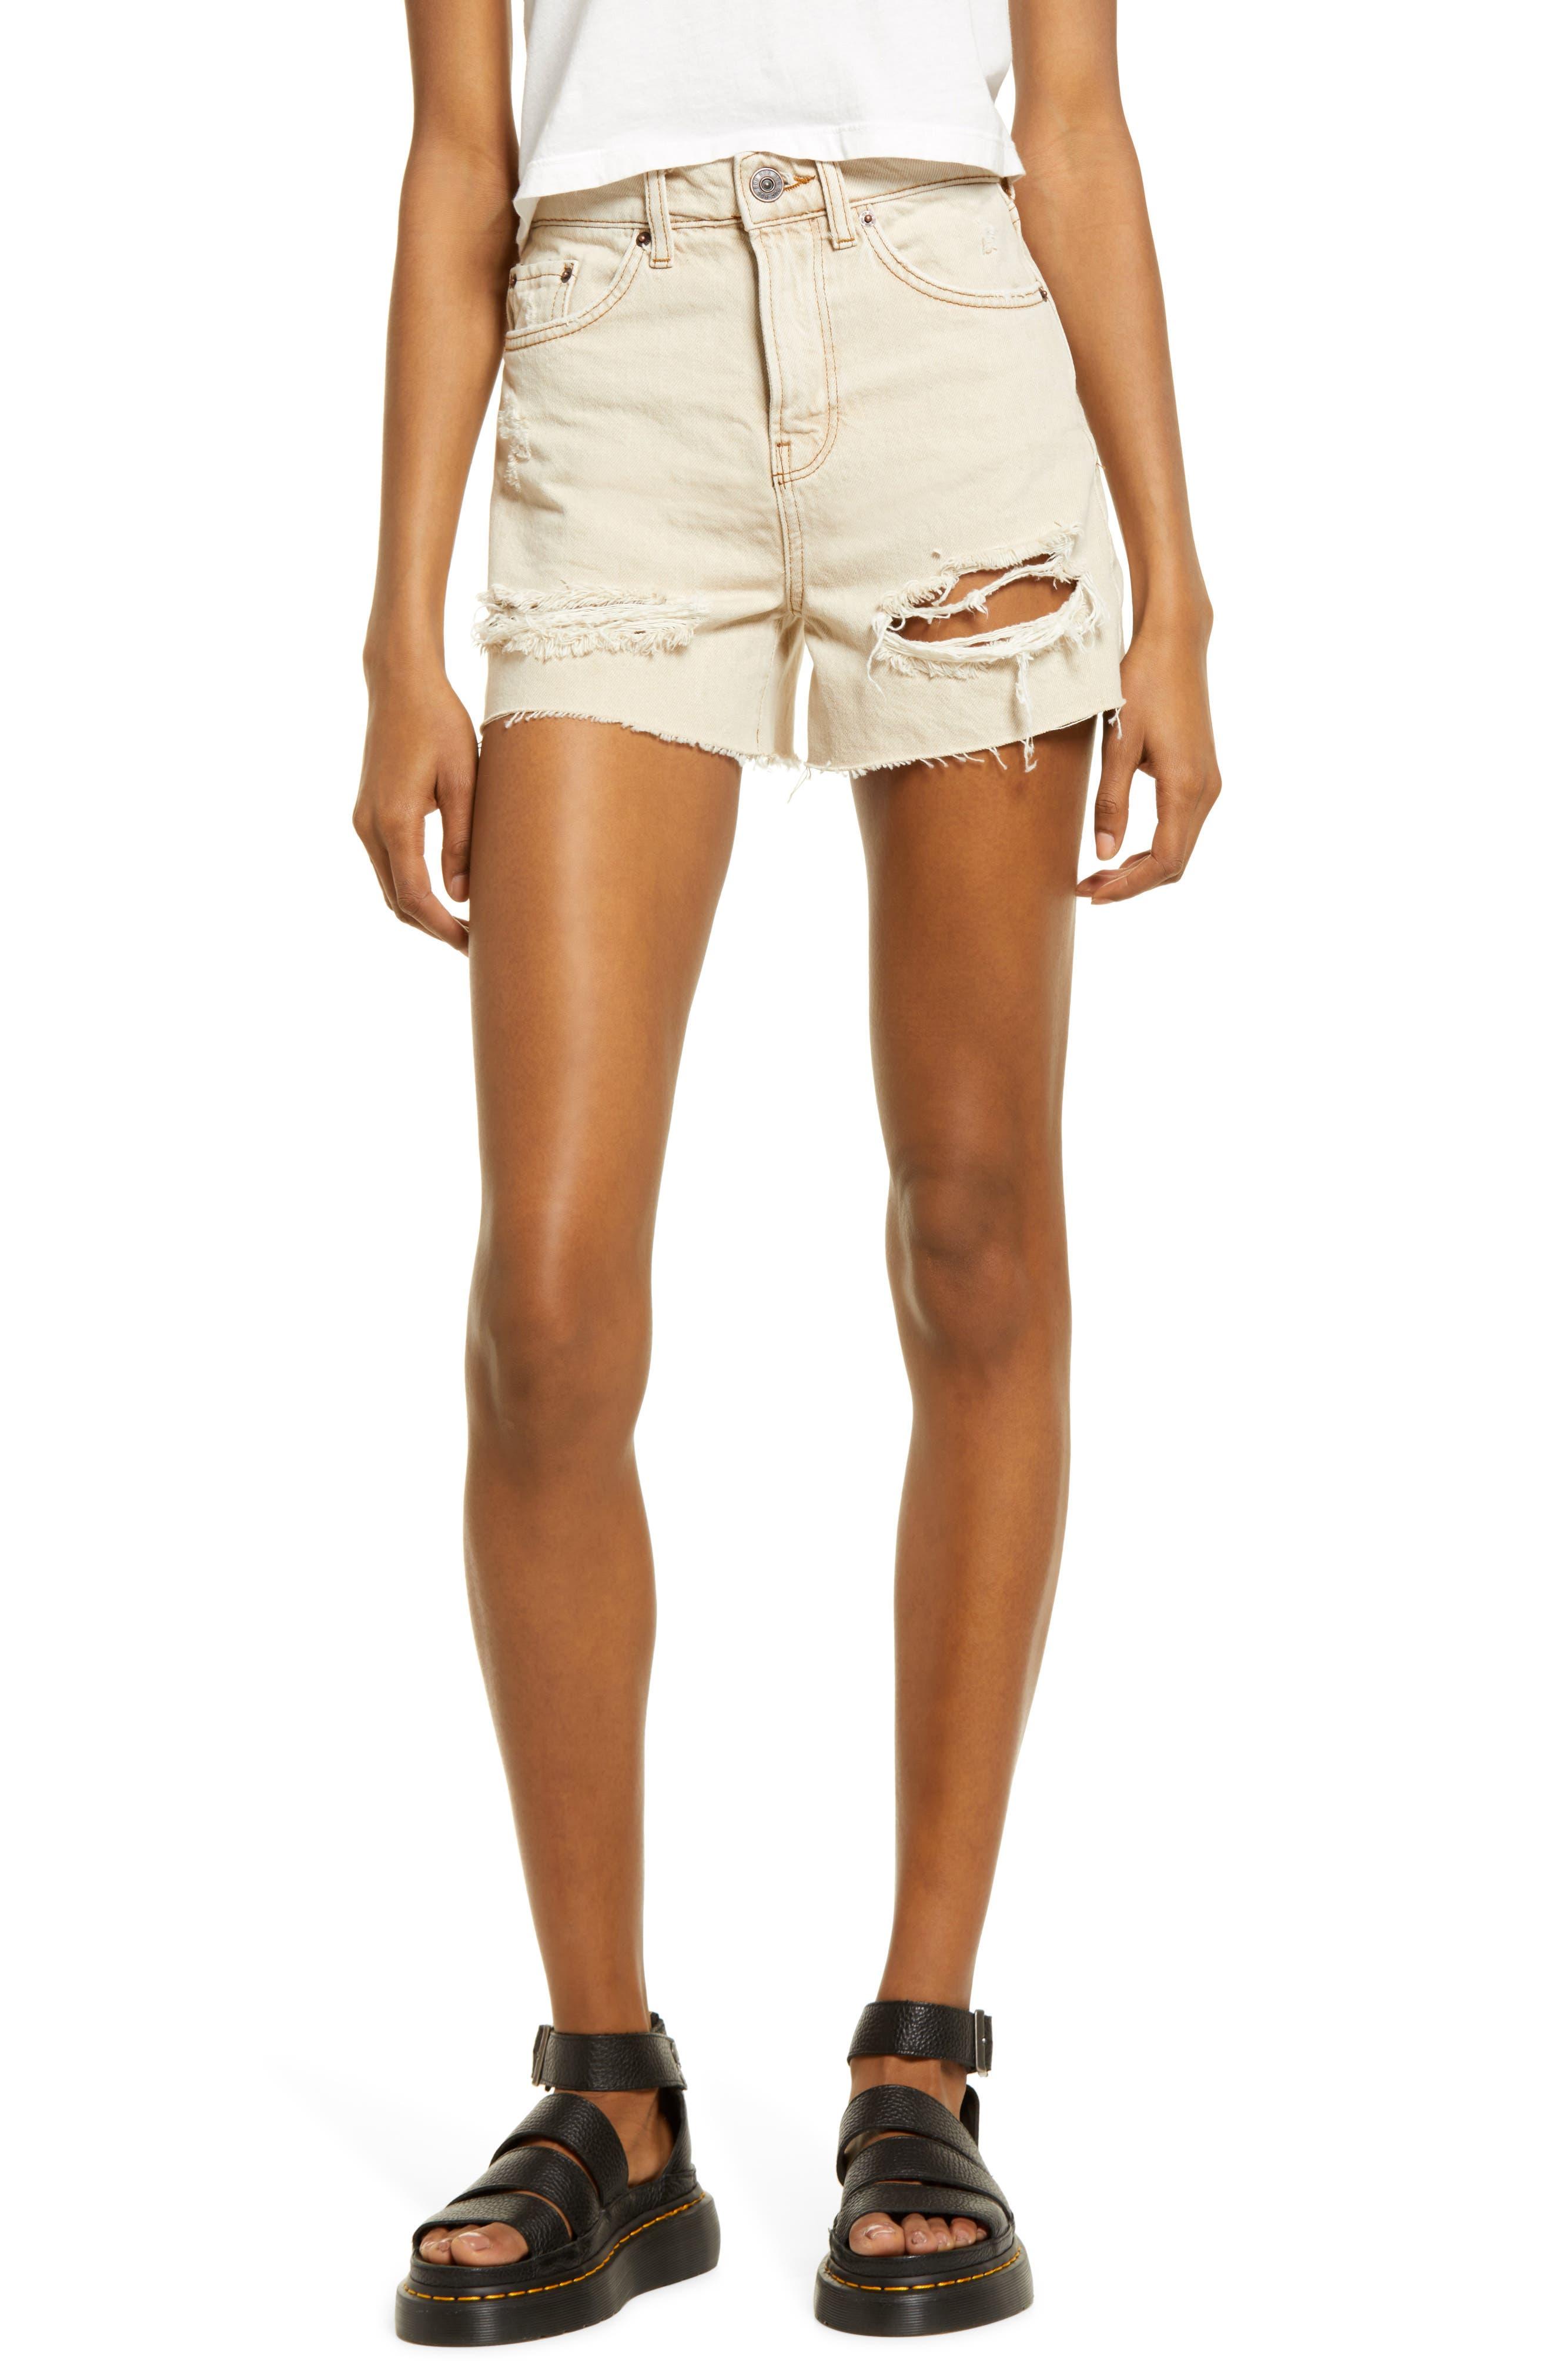 Pax Ripped High Waist Denim Shorts